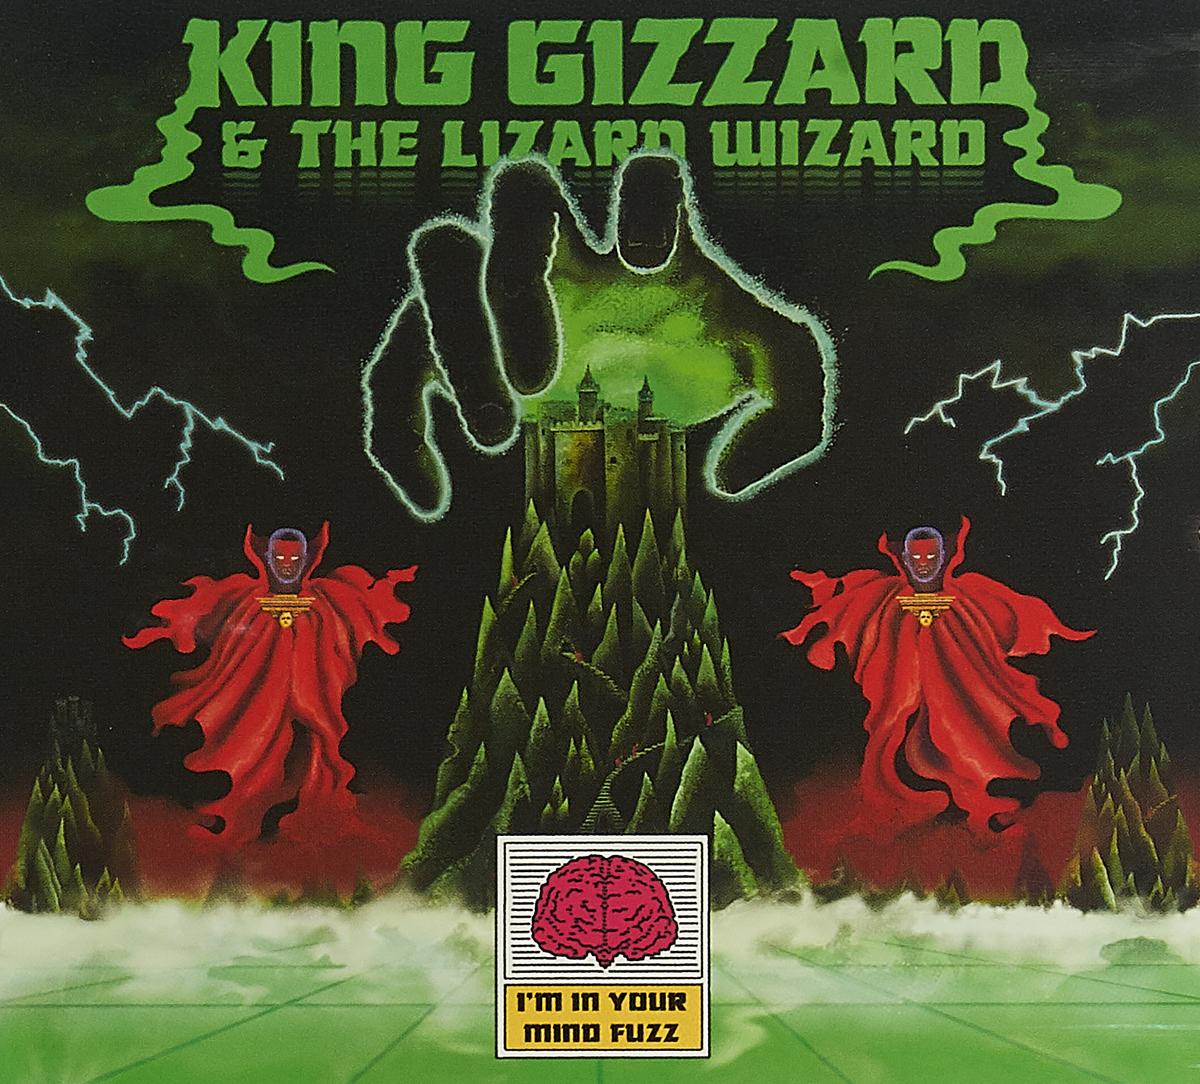 все цены на King Gizzard & The Lizard Wizard King Gizzard And The Lizard Wizard. I'm In Your Mind Fuzz онлайн